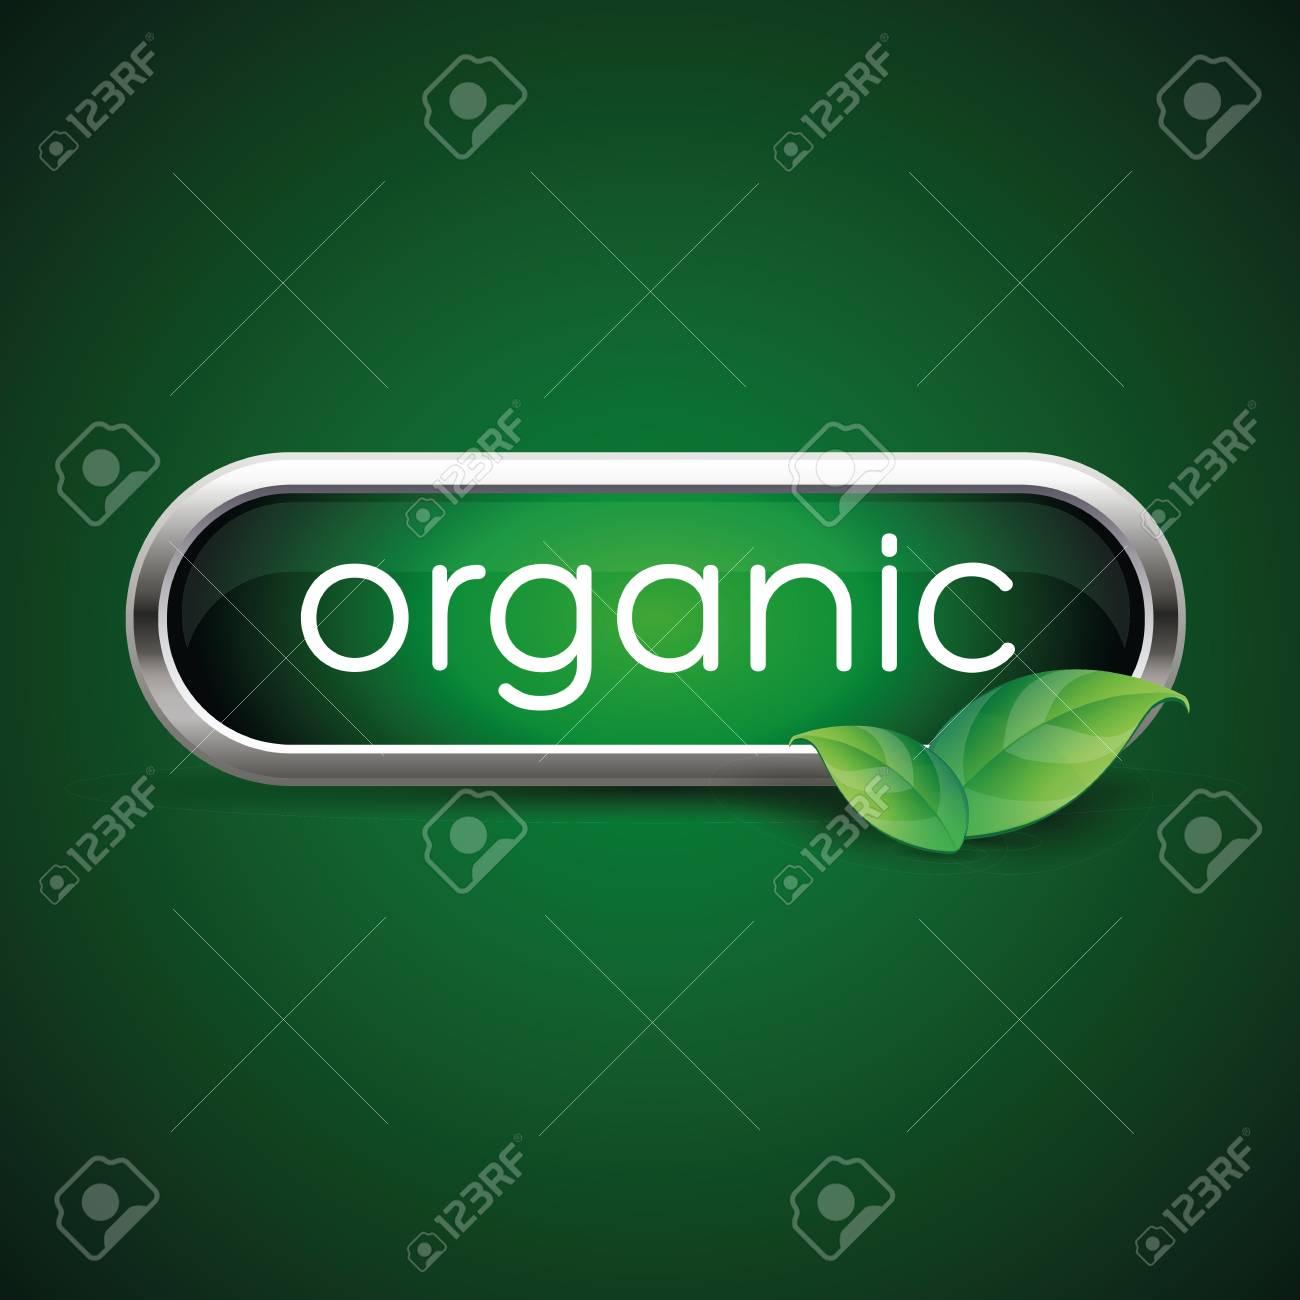 Organic label green button - 37288936